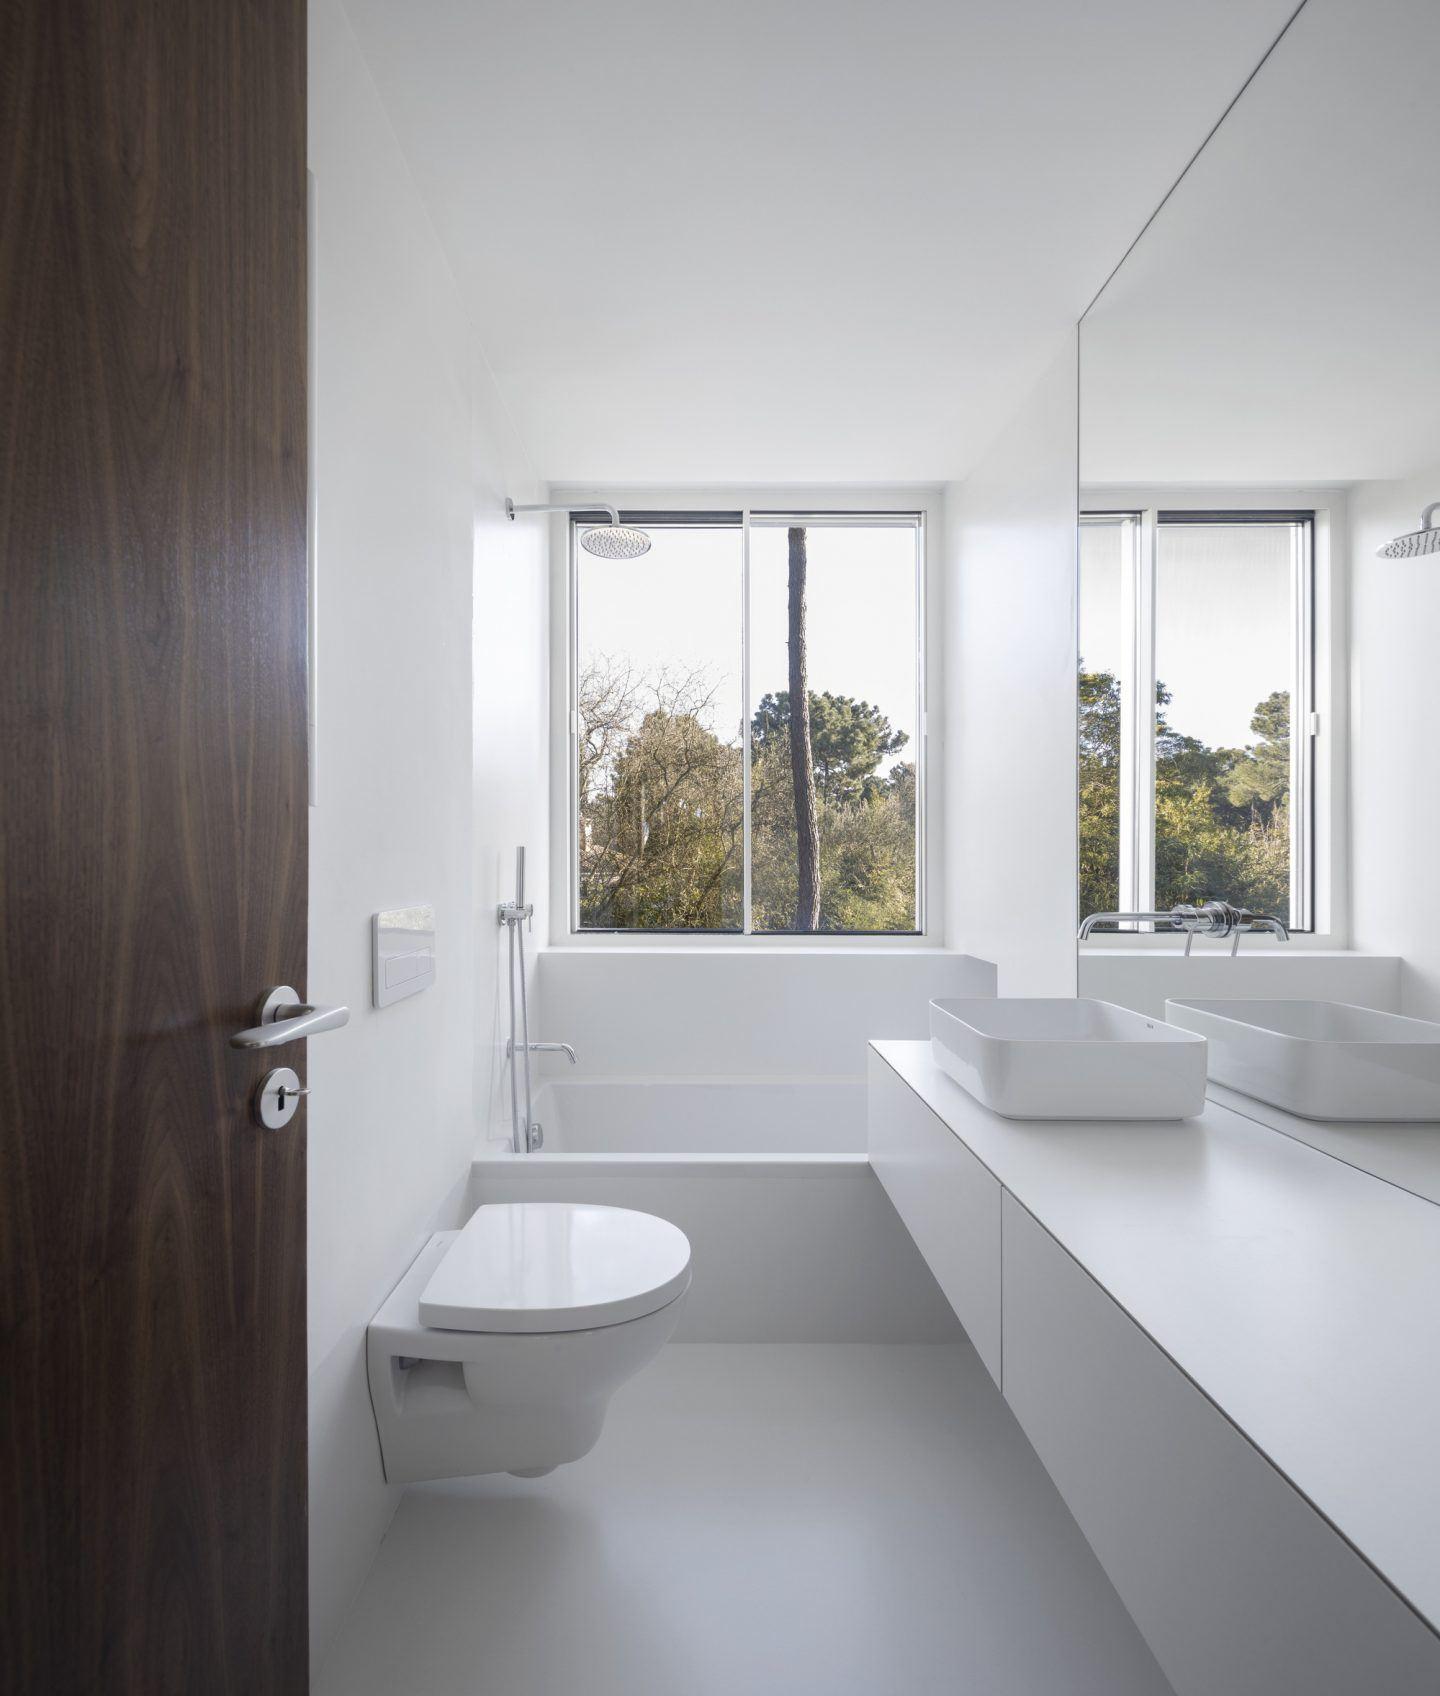 IGNANT-Architecture-Bica-Arquitectos-Herdade-da-Aroeira-House-003